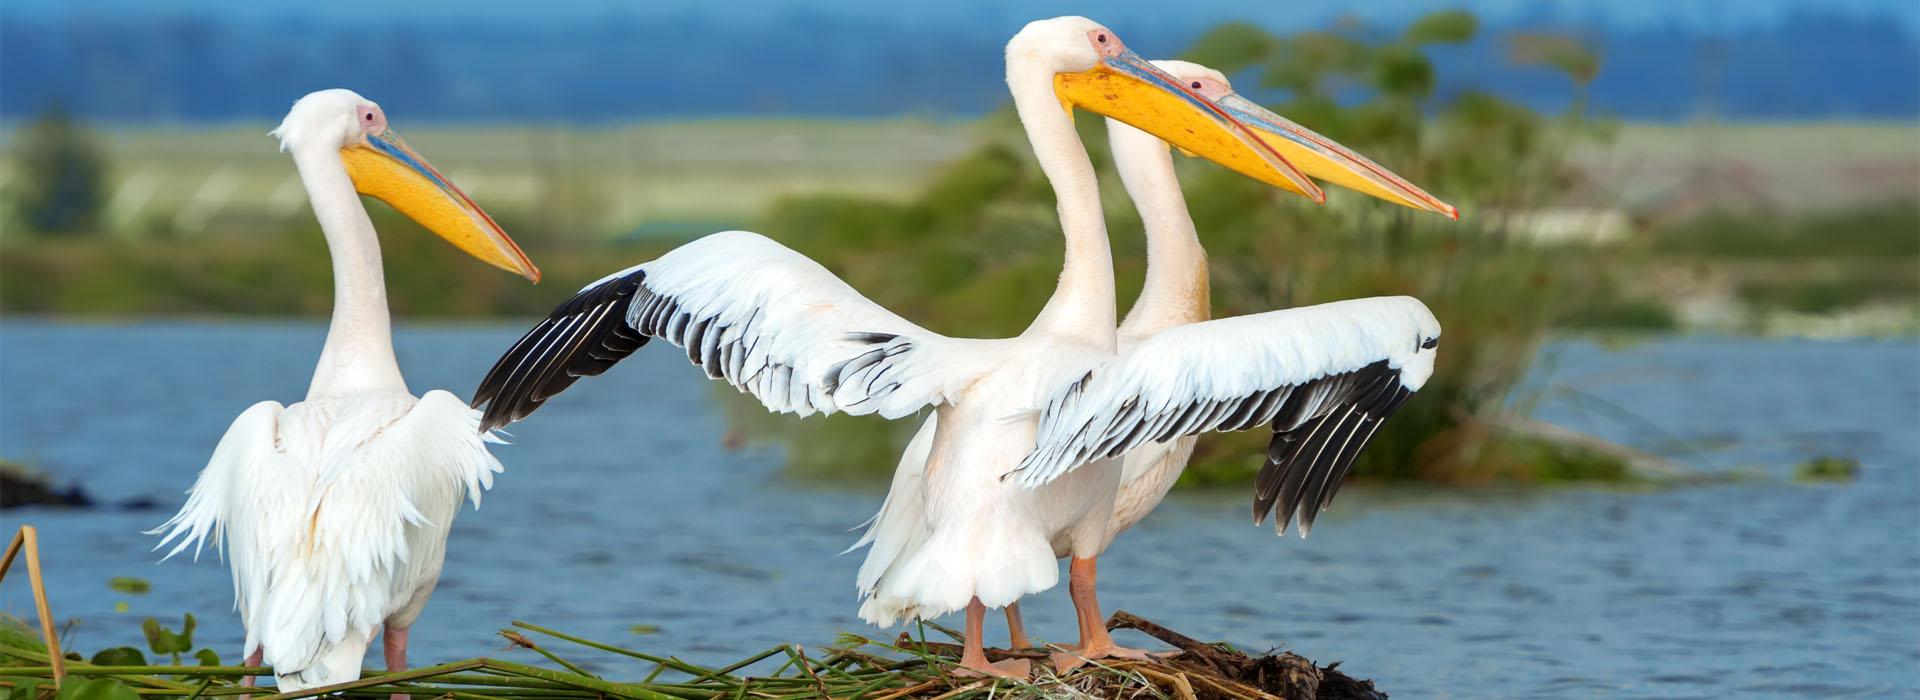 Birding at Semuliki National Park - Top Destinations African Adventure Specialists